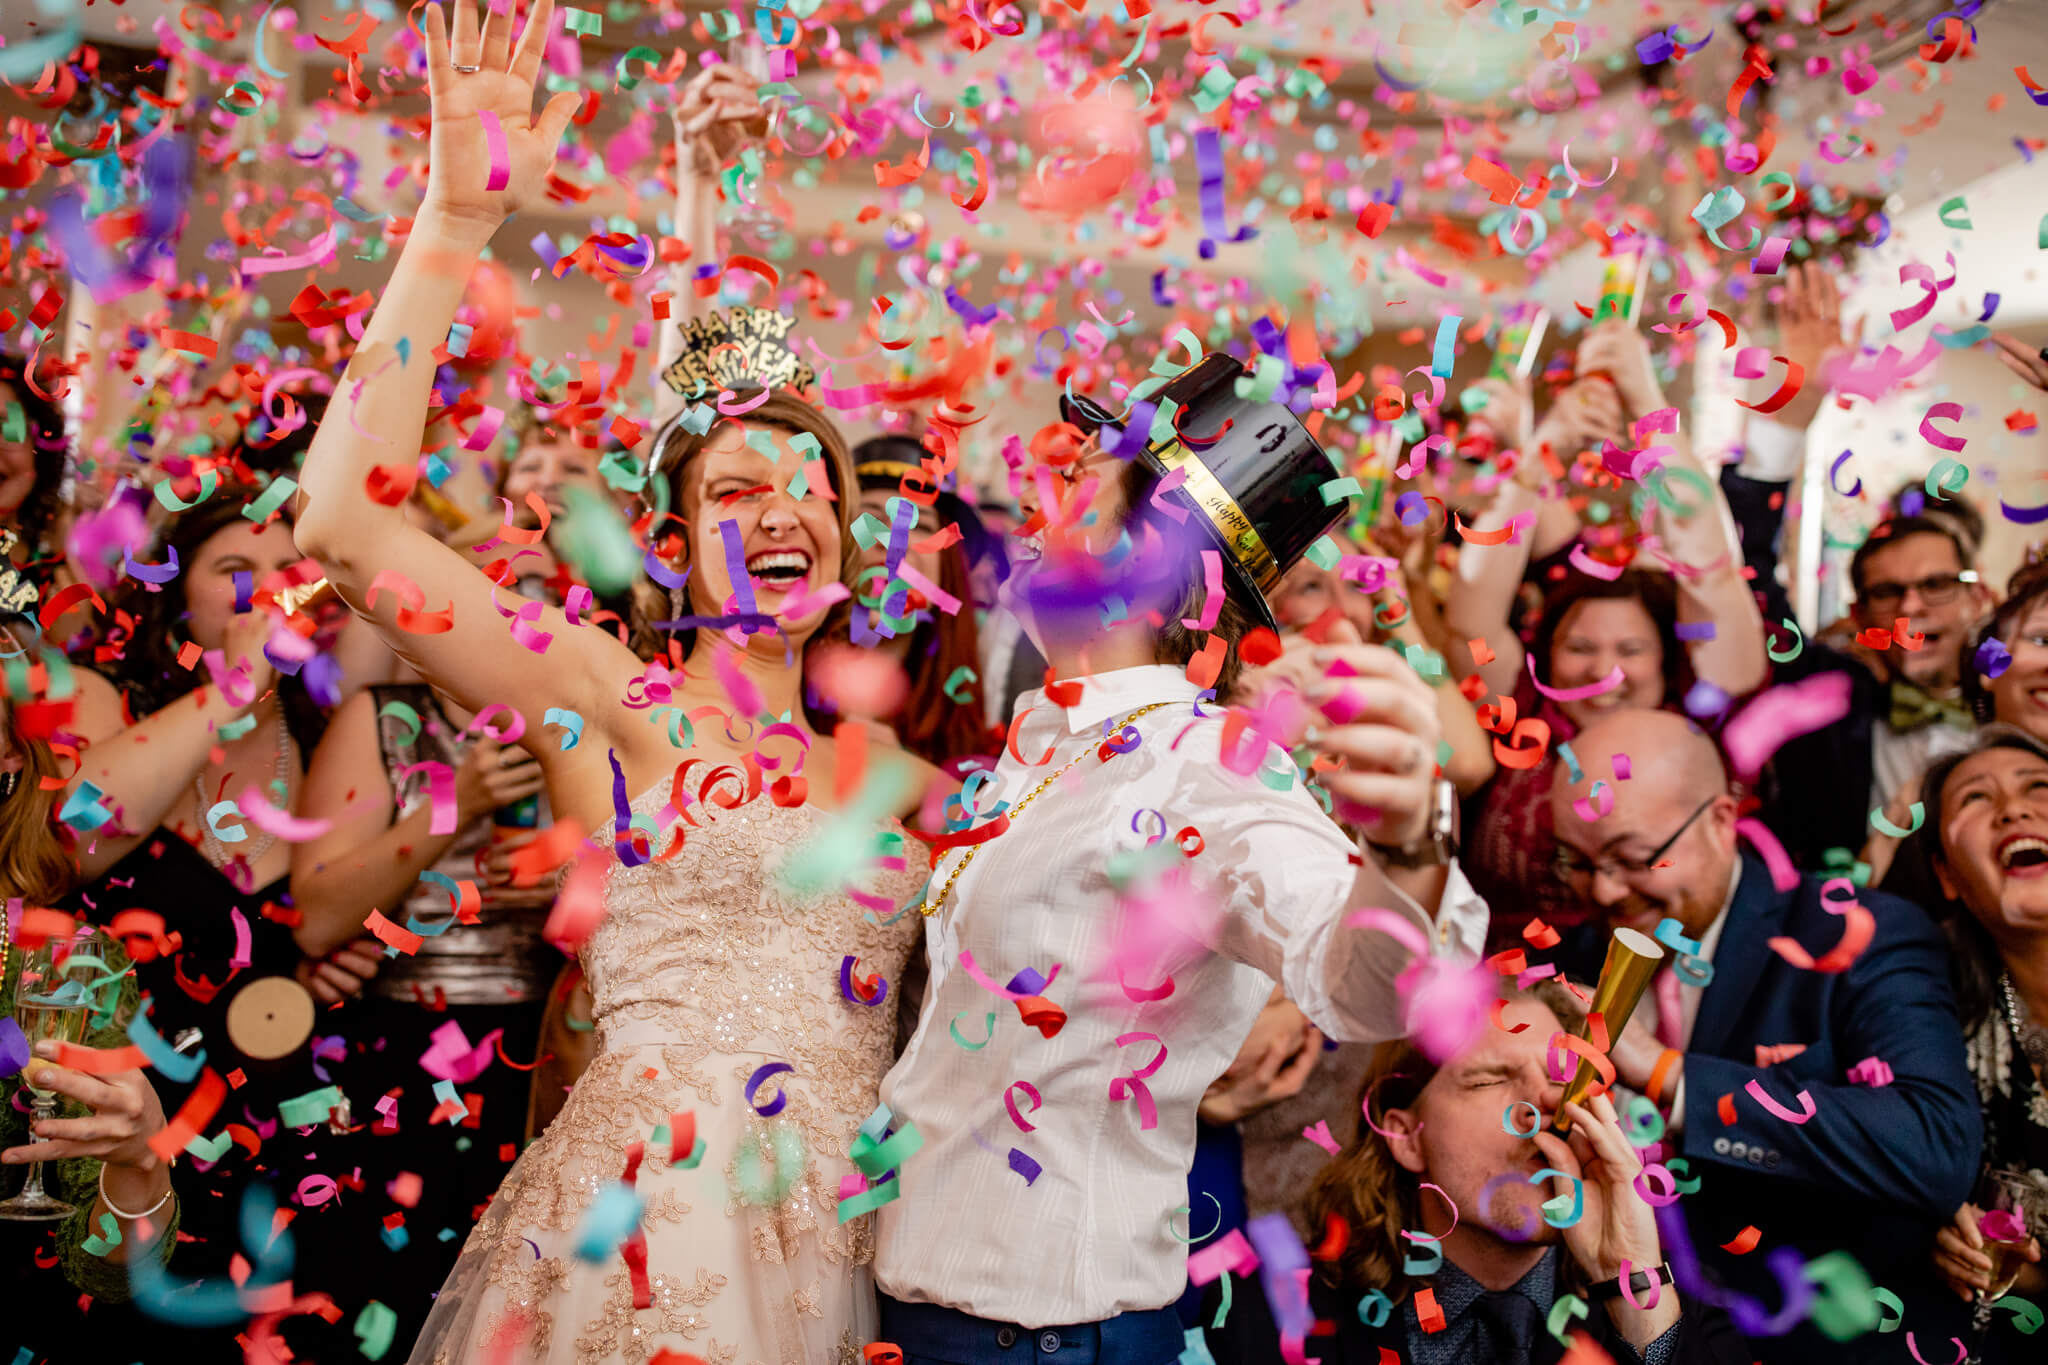 Melissa Jill New Years Eve 2017 Ceresville Mansion Confetti Celebration NYE19.jpg